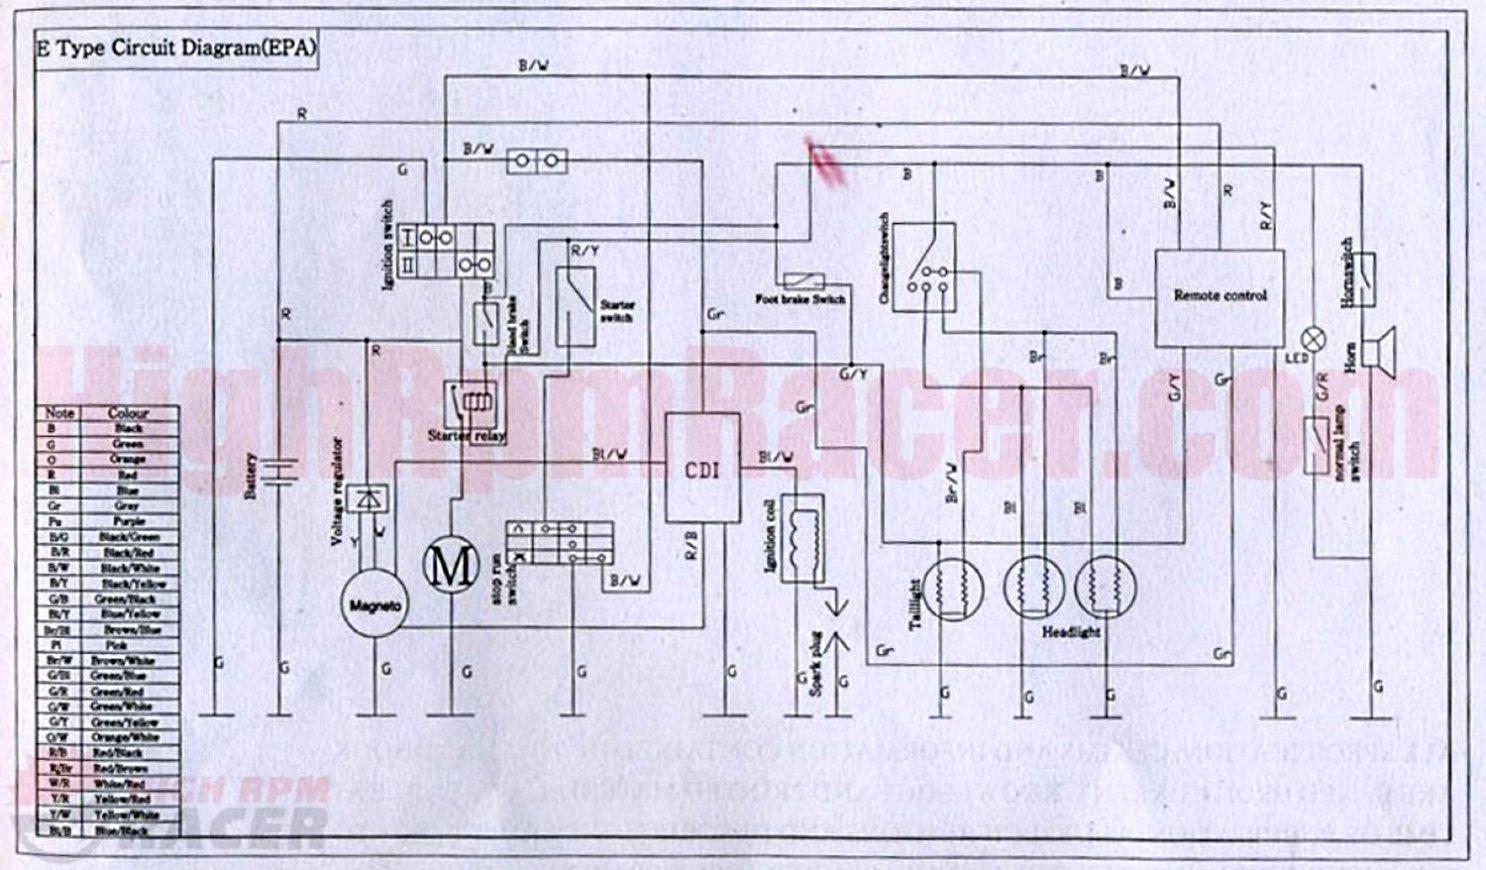 Suzuki 110Cc Atv Wiring Diagram | Wiring Diagram - Tao Tao 110 Atv Wiring Diagram